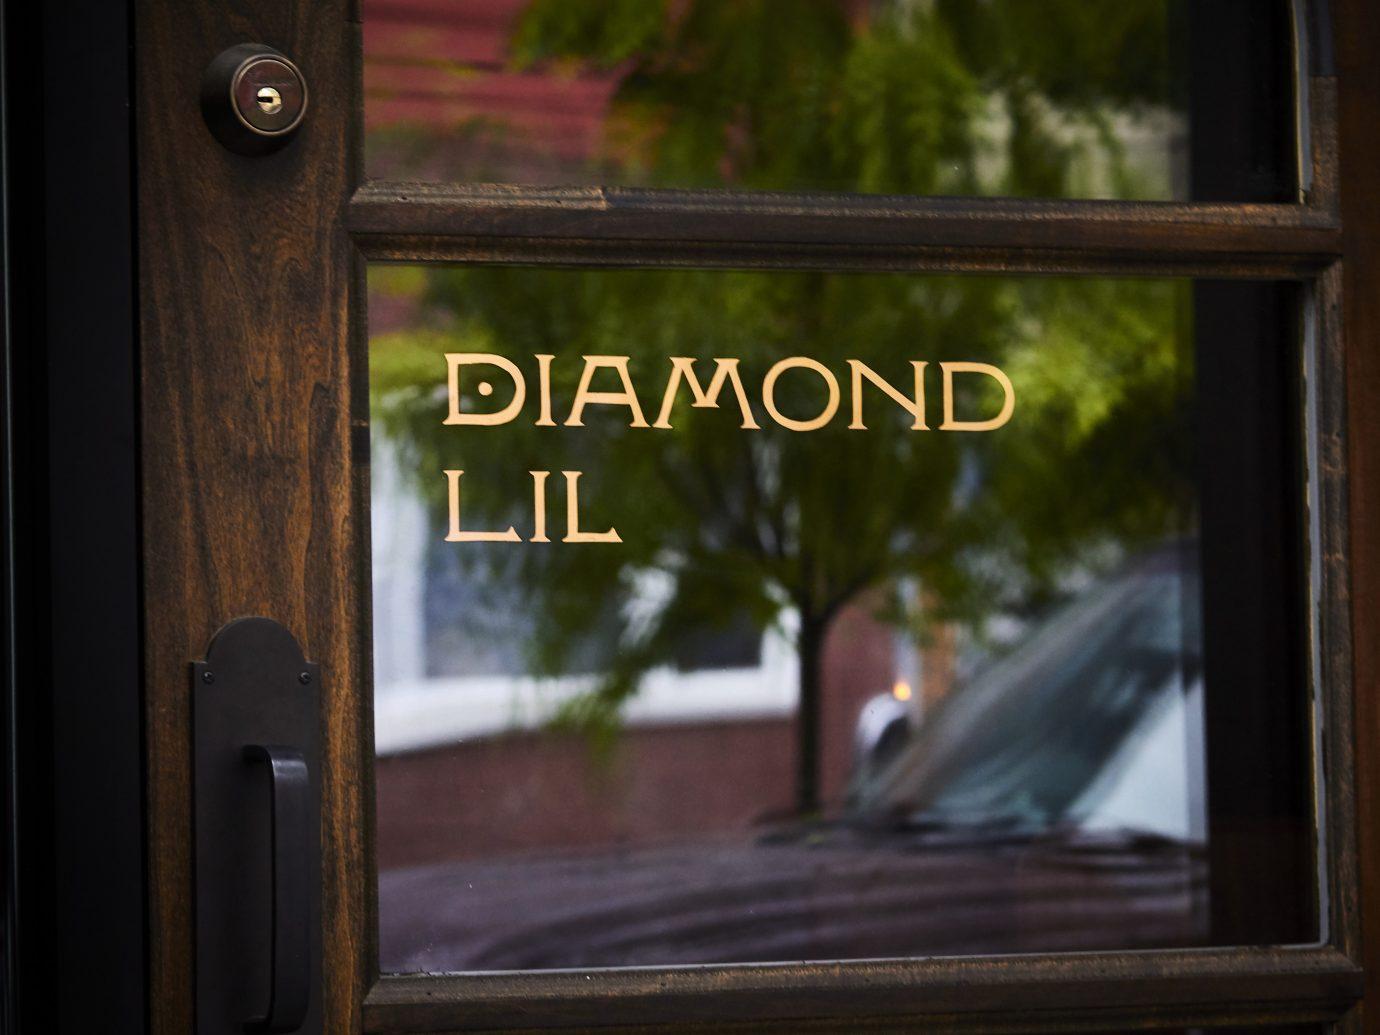 Diamond Lil